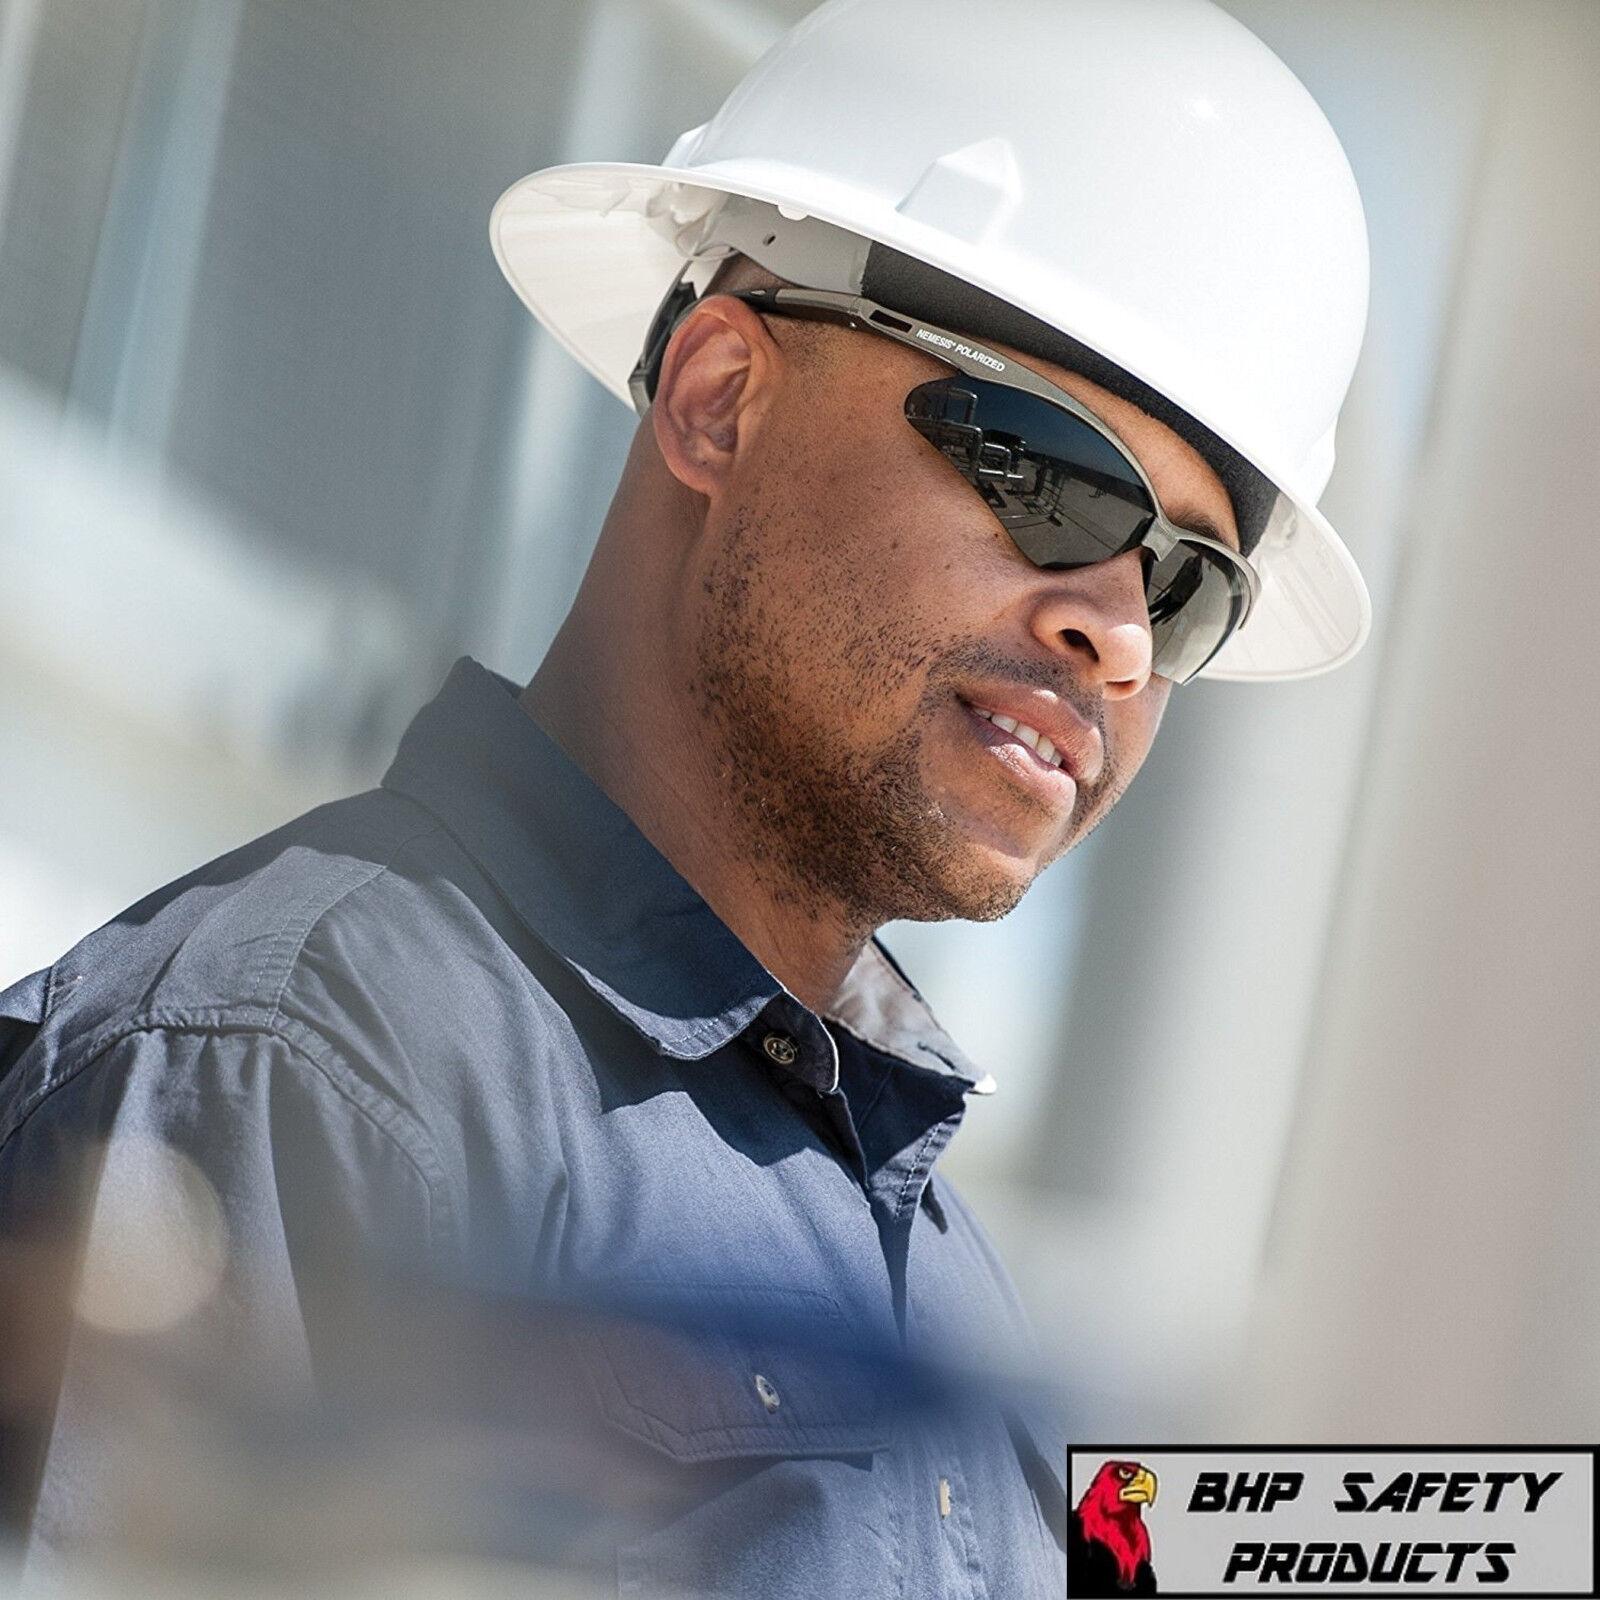 JACKSON NEMESIS SAFETY GLASSES SUNGLASSES SPORT WORK EYEWEAR ANSI Z87 COMPLIANT